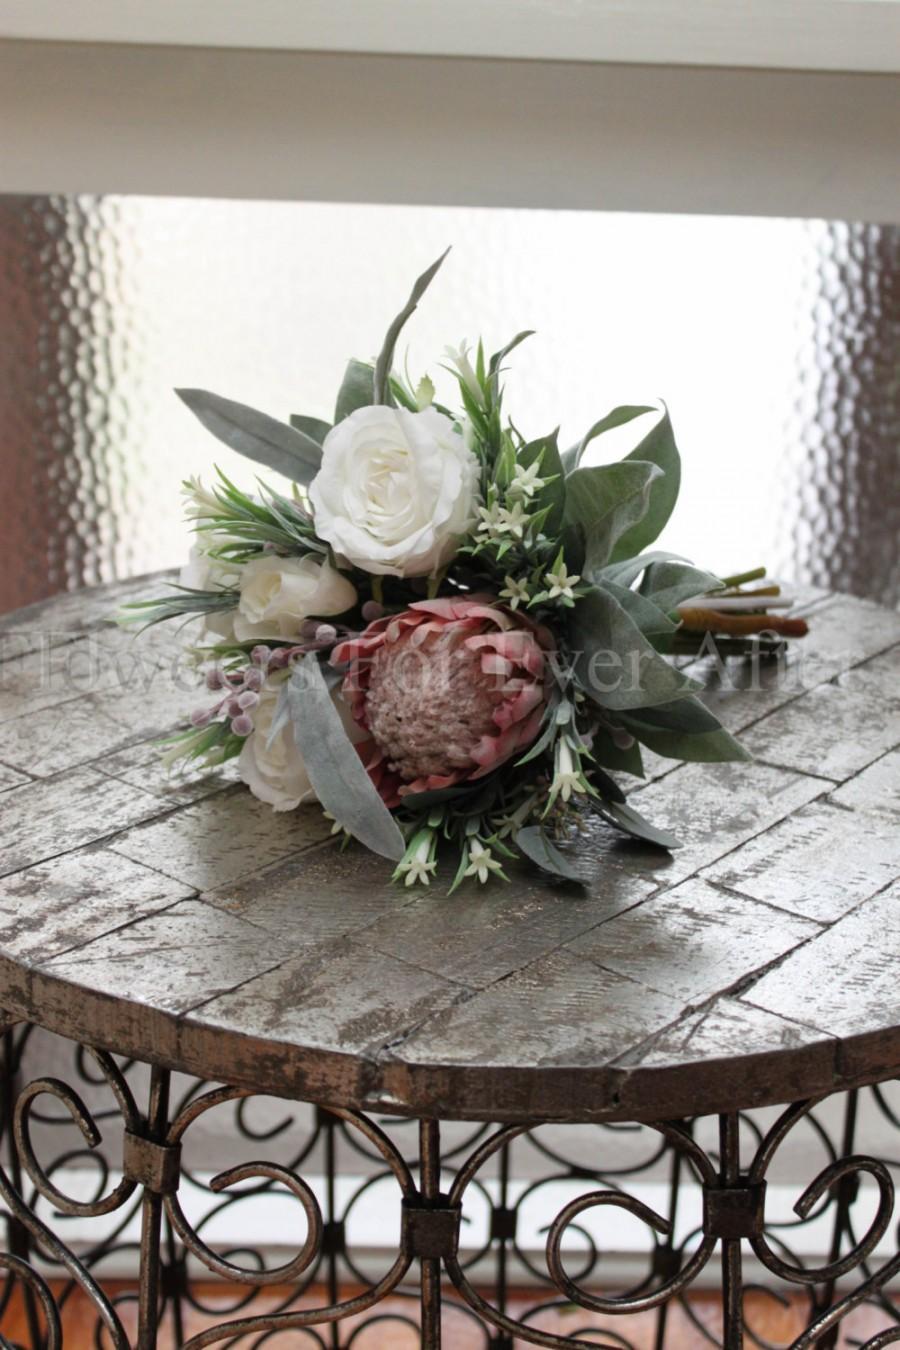 Lorraine ii bridesmaid soft pink protea with australian natives and lorraine ii bridesmaid soft pink protea with australian natives and roses romantic silk wedding artificial bridal bouquet izmirmasajfo